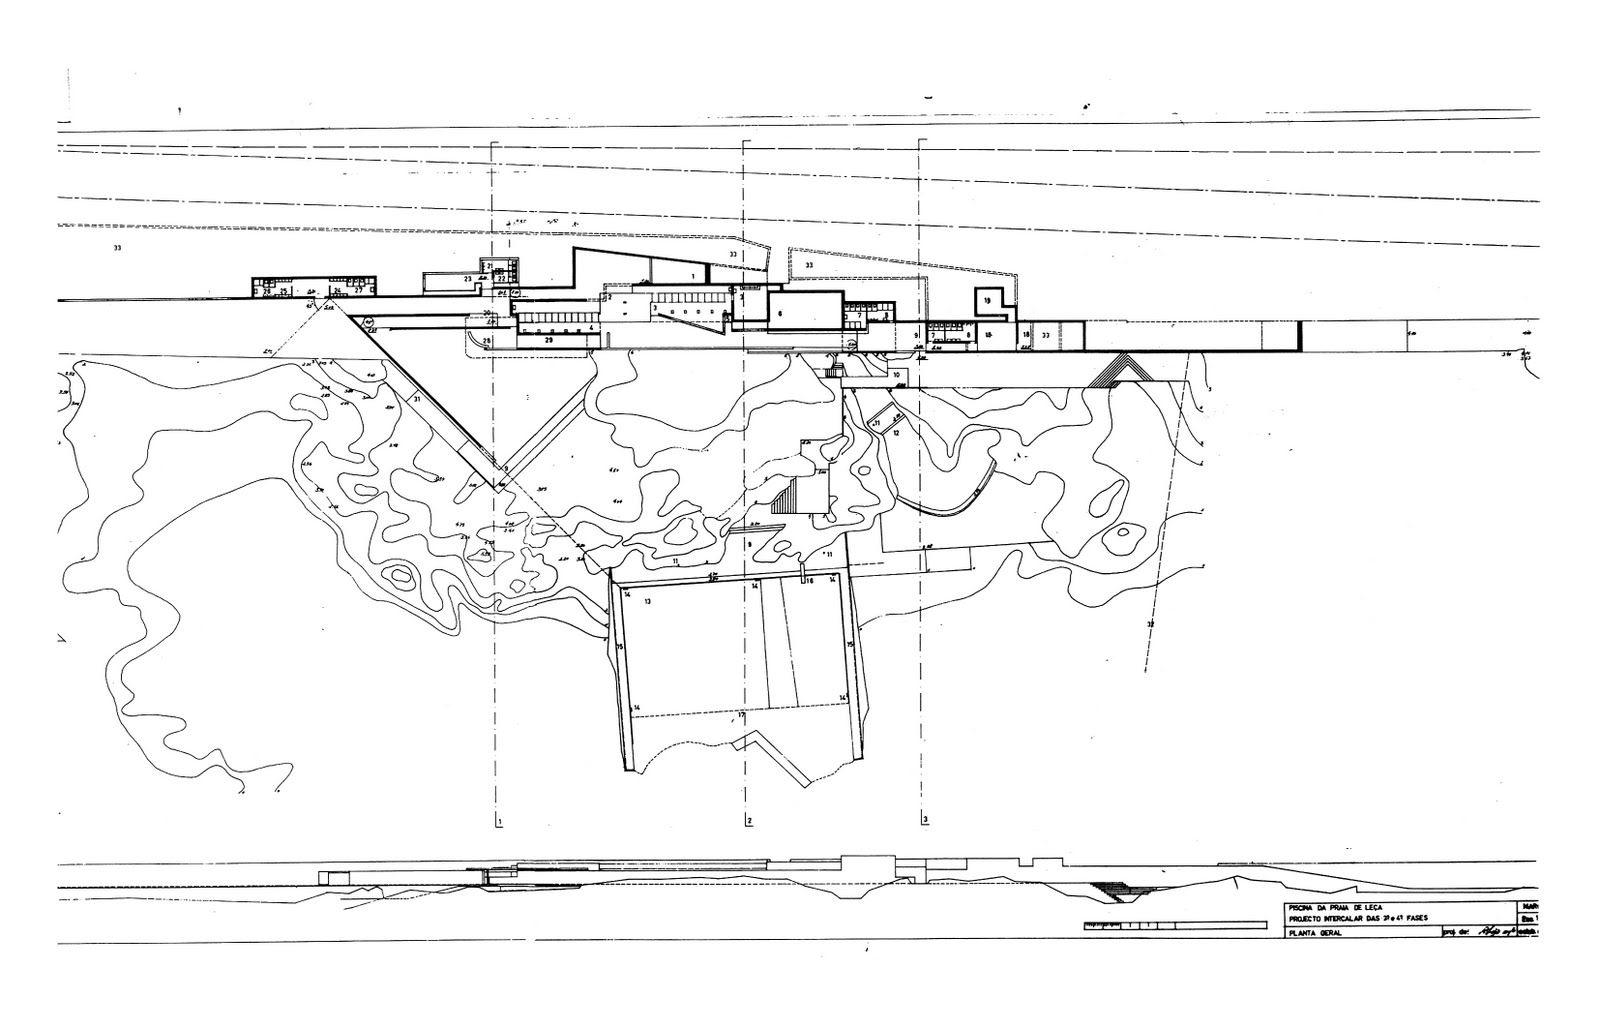 Alvaro siza piscinas le a da palmeira landscape city for Pool design drawings